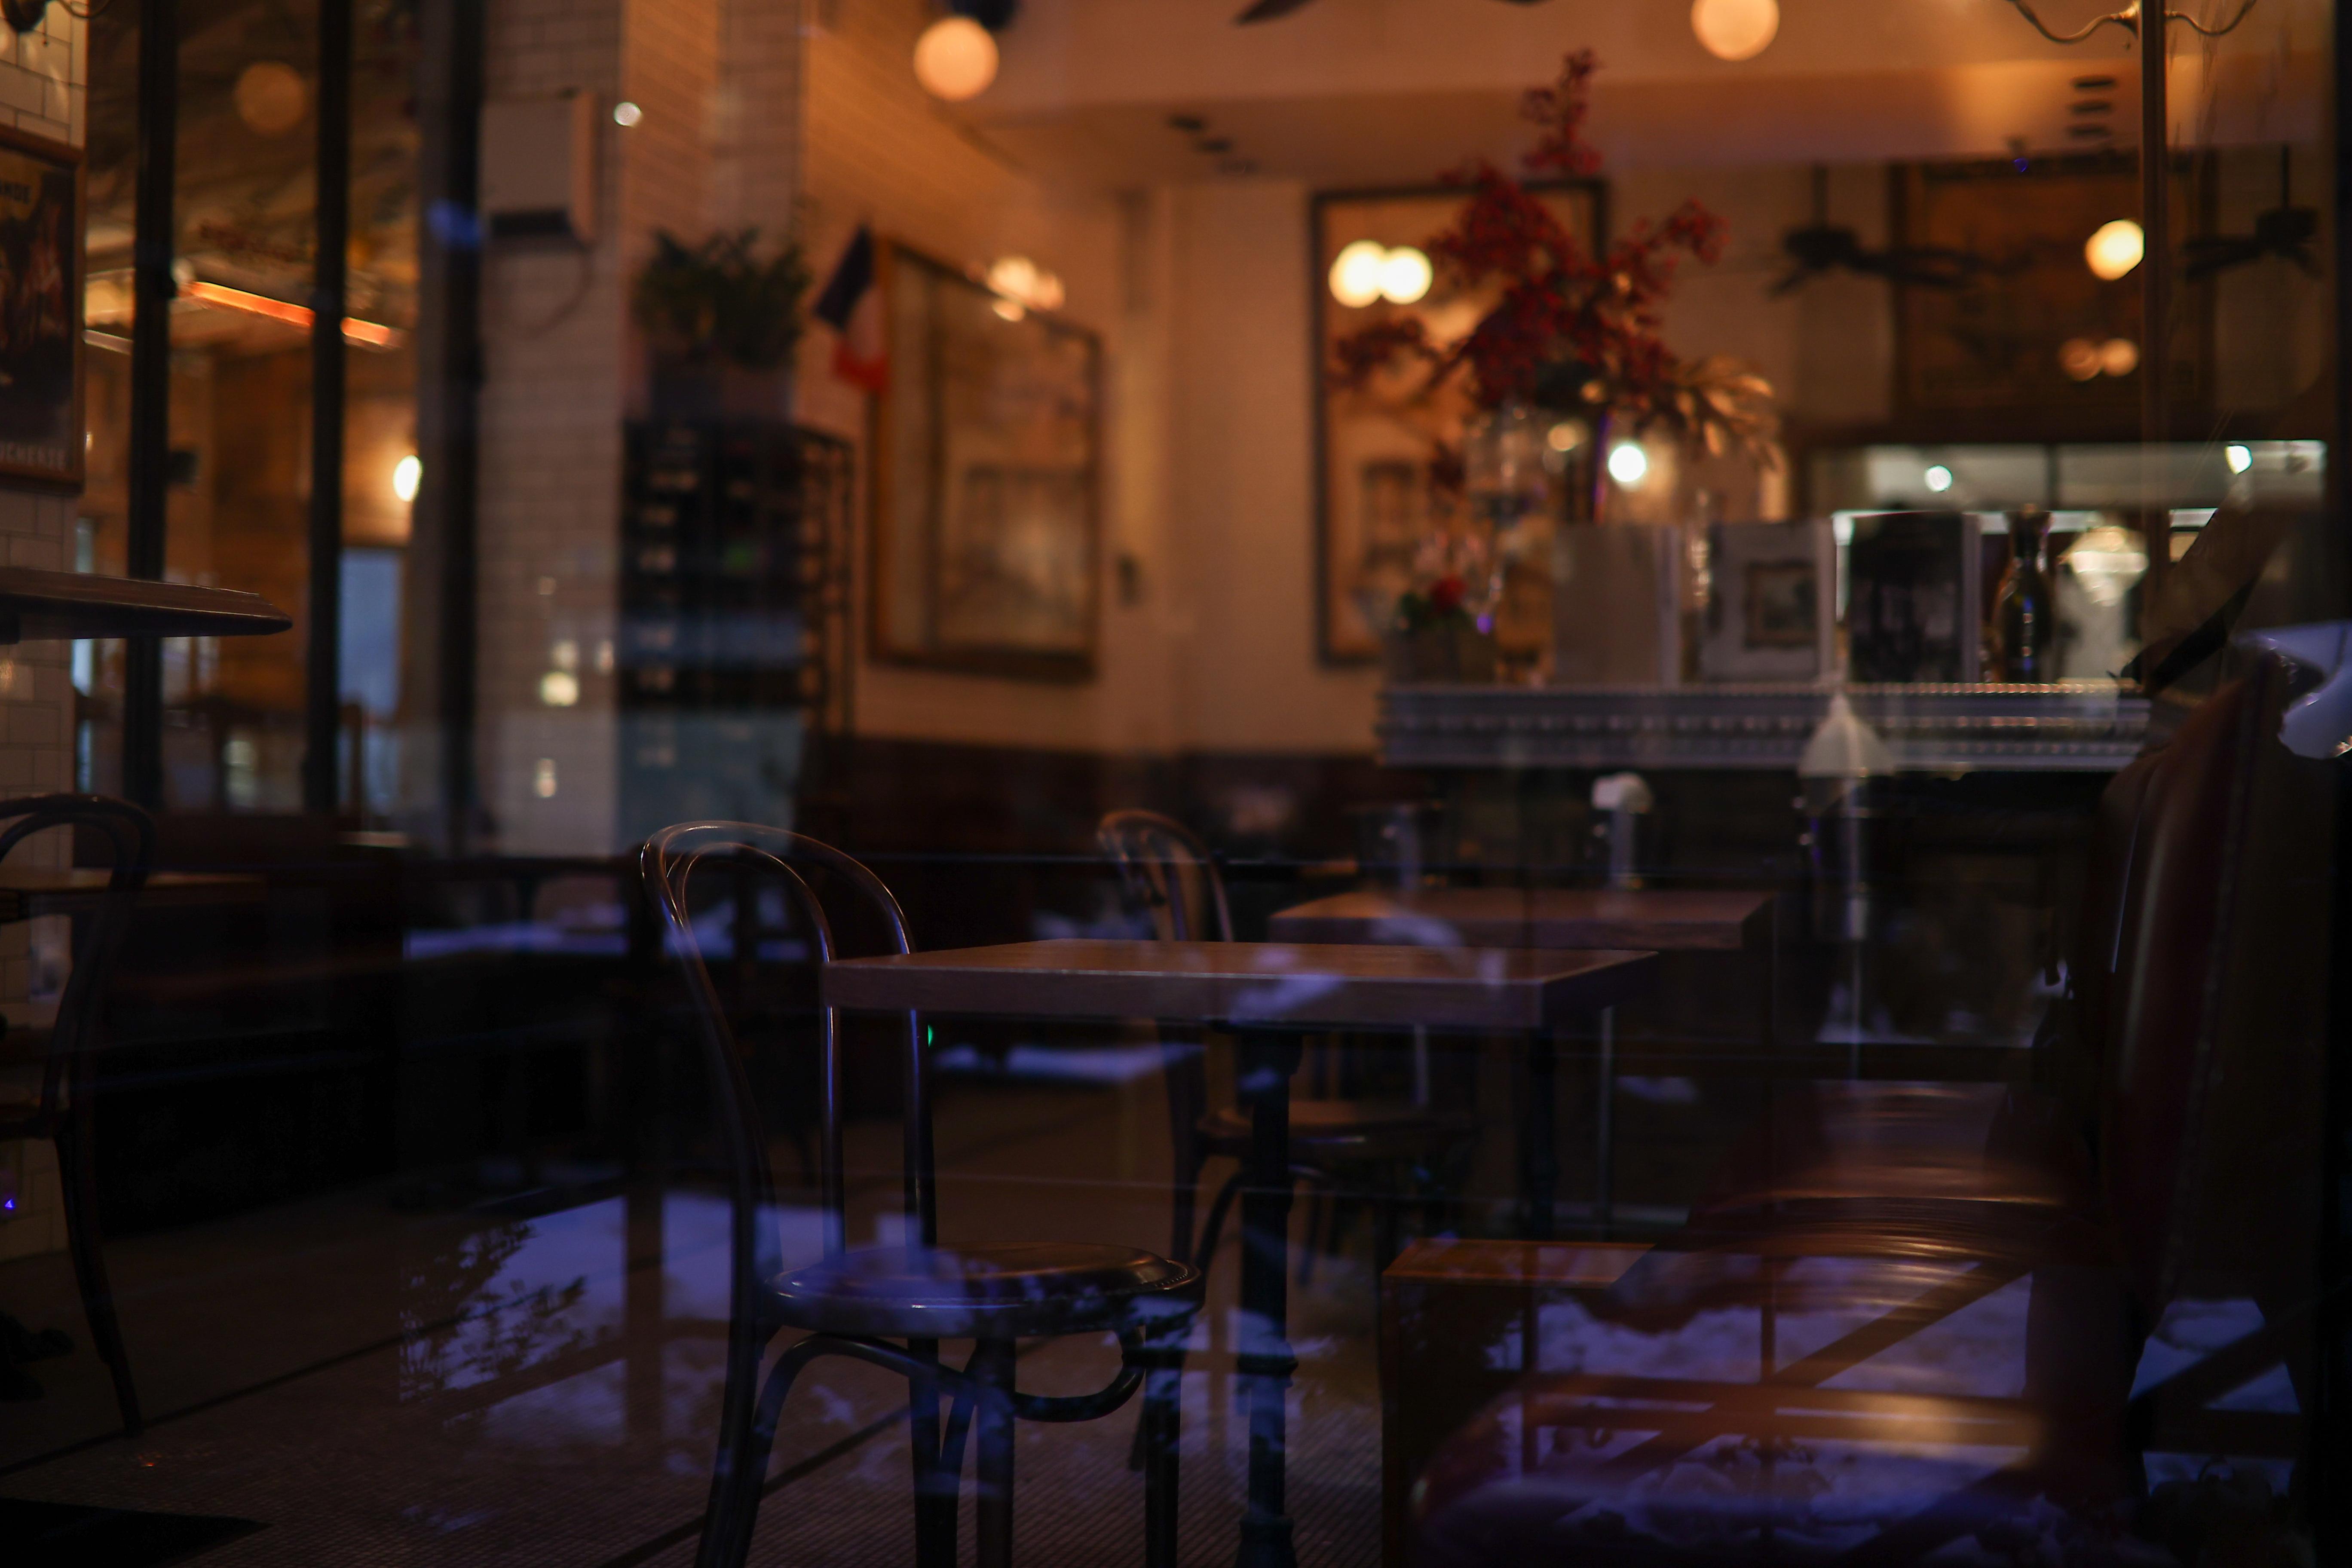 An empty dining room inside a restaurant